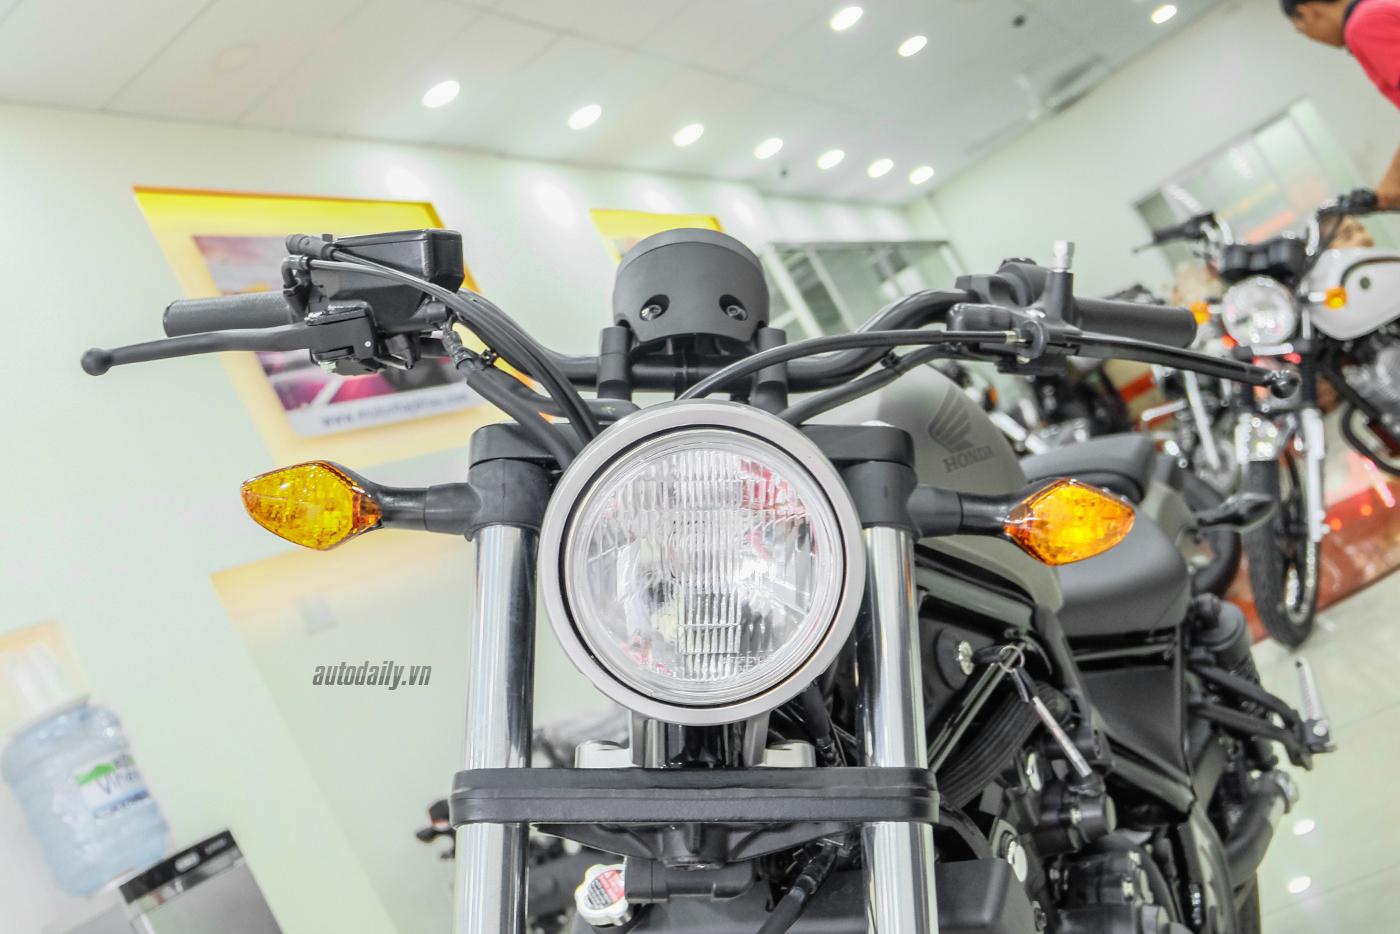 honda-rebel-500-abs-2017-16-1.jpg